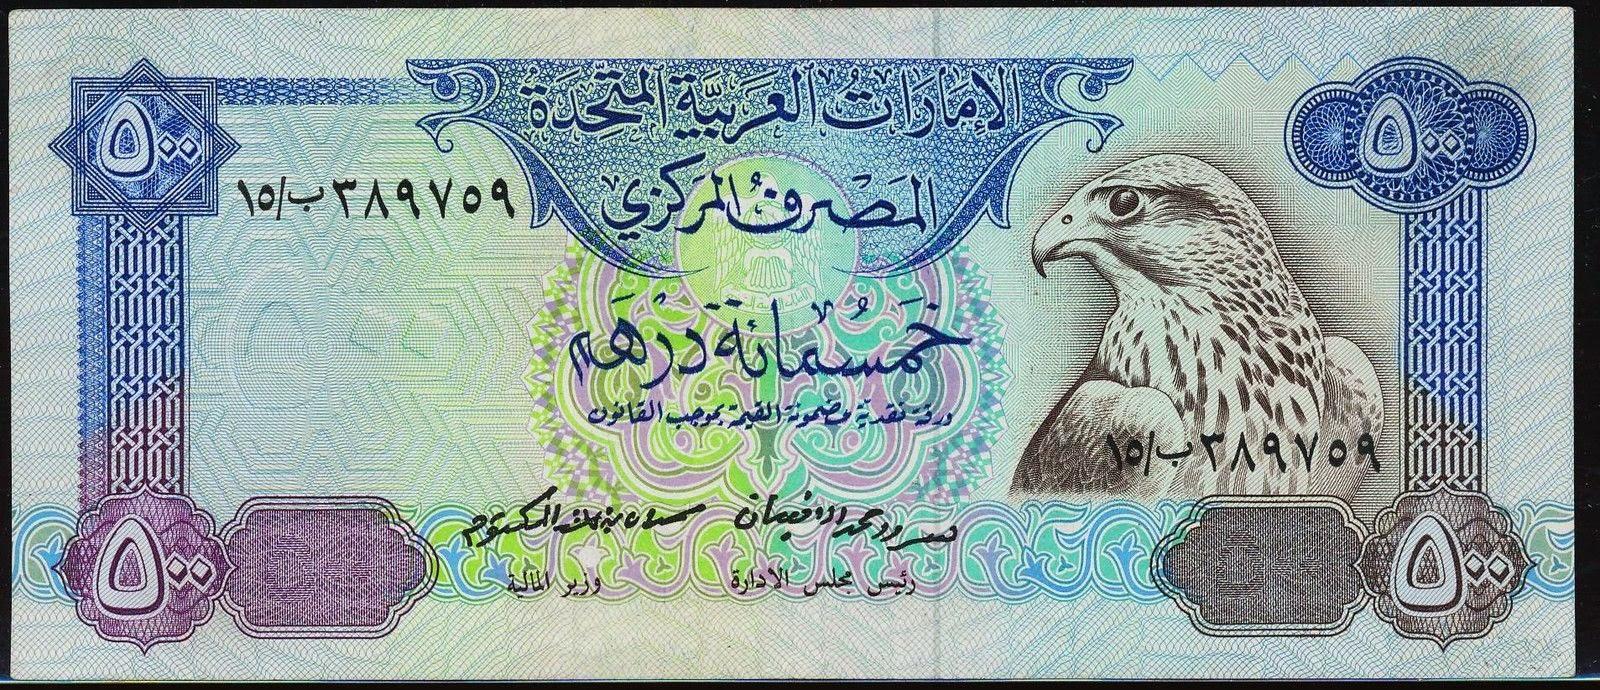 United Arab Emirates Banknotes 500 Dirham note 1983 Sparrowhawk head